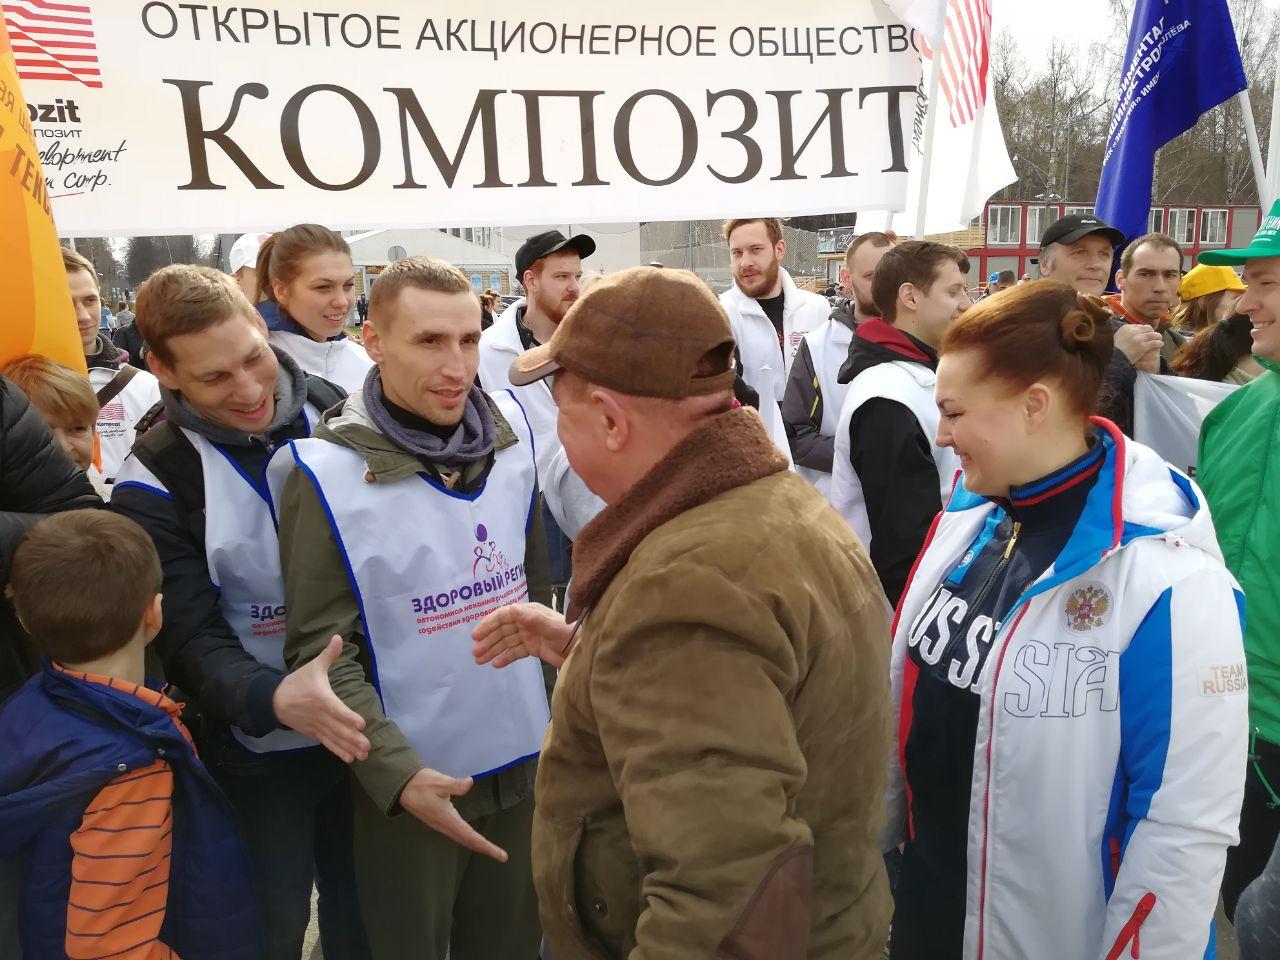 Subotnik Korolev 1